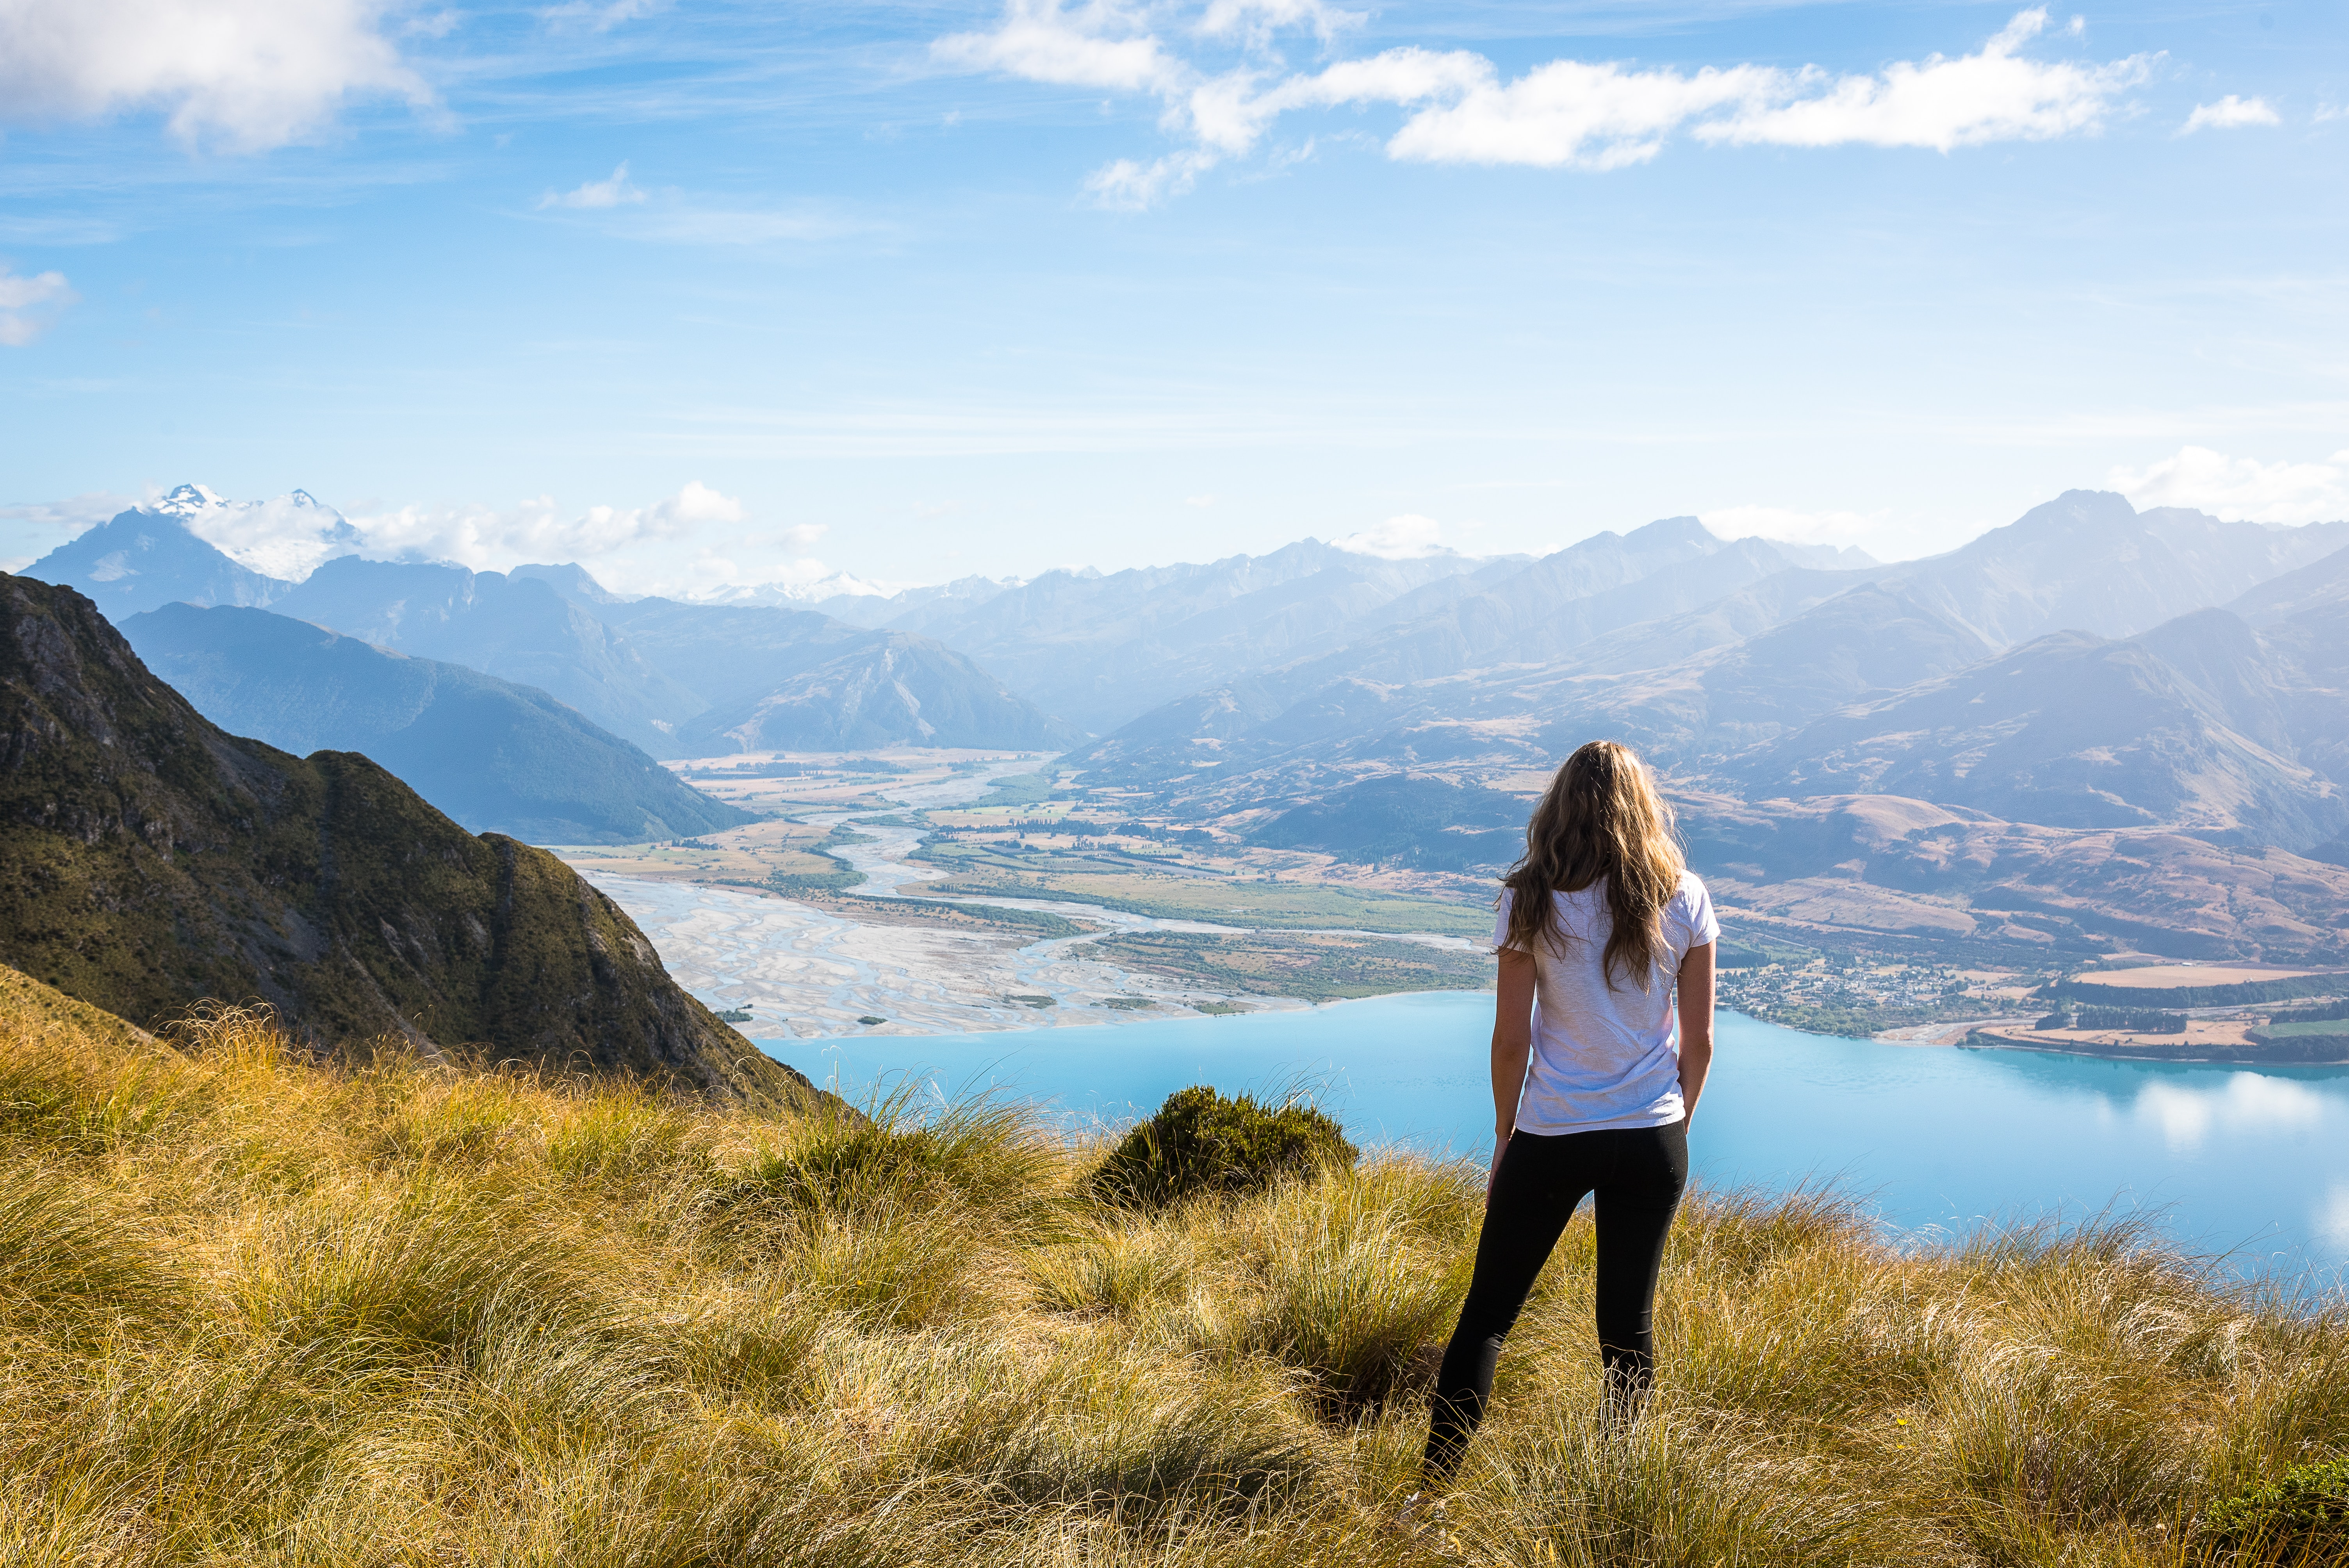 New Zealand woman overlooking mountains